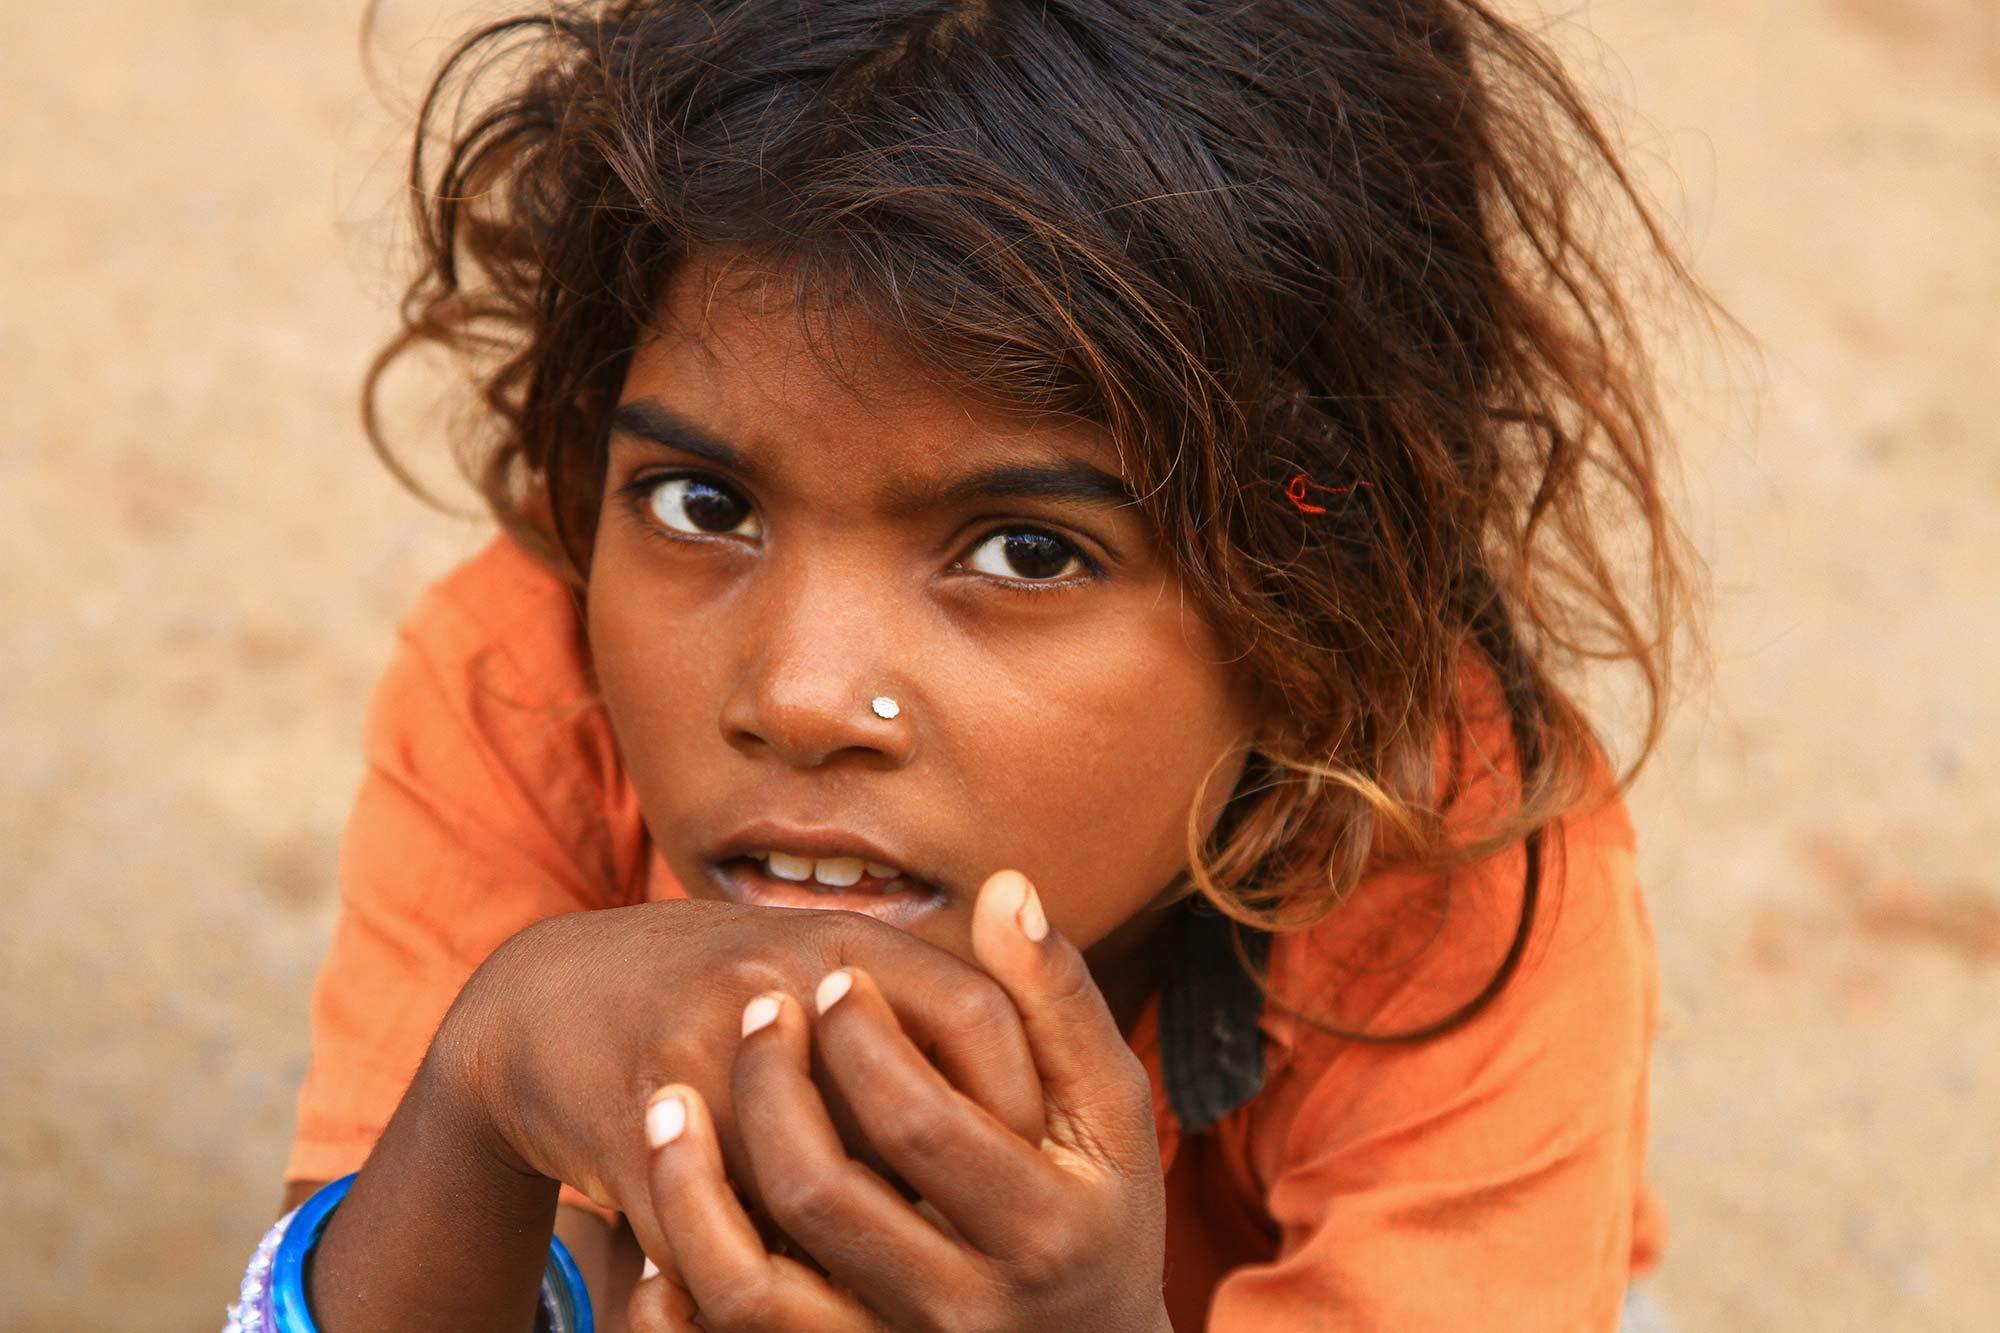 portrait-homeless-street-girl-varanasi-india